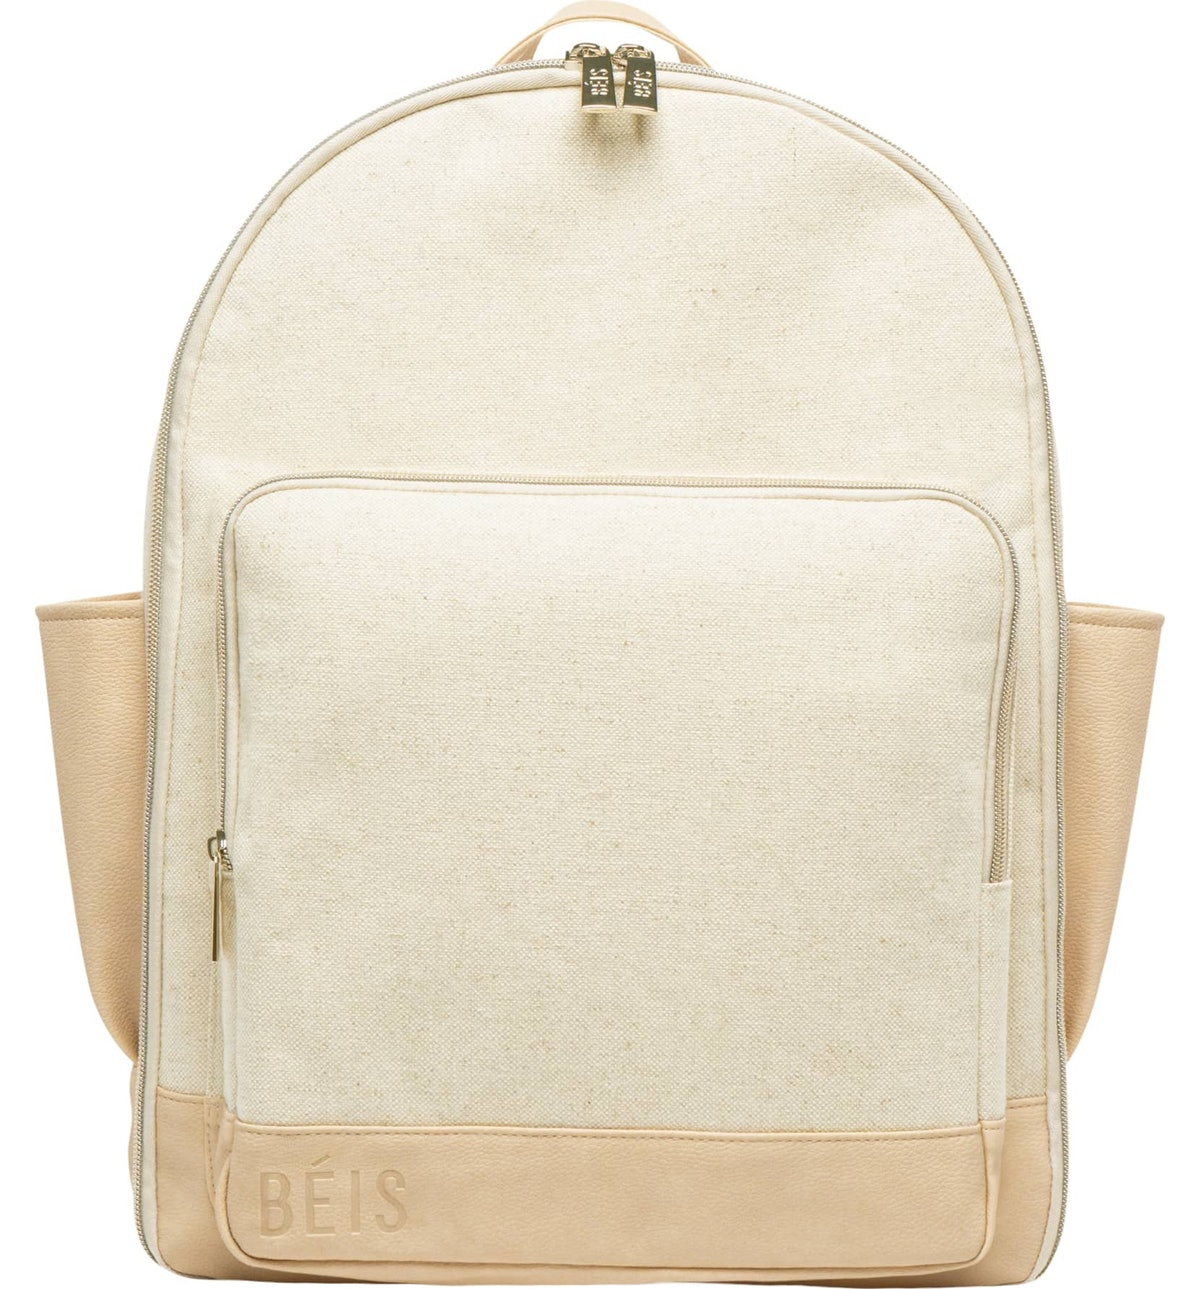 Beis Travel Multi Function Backpack